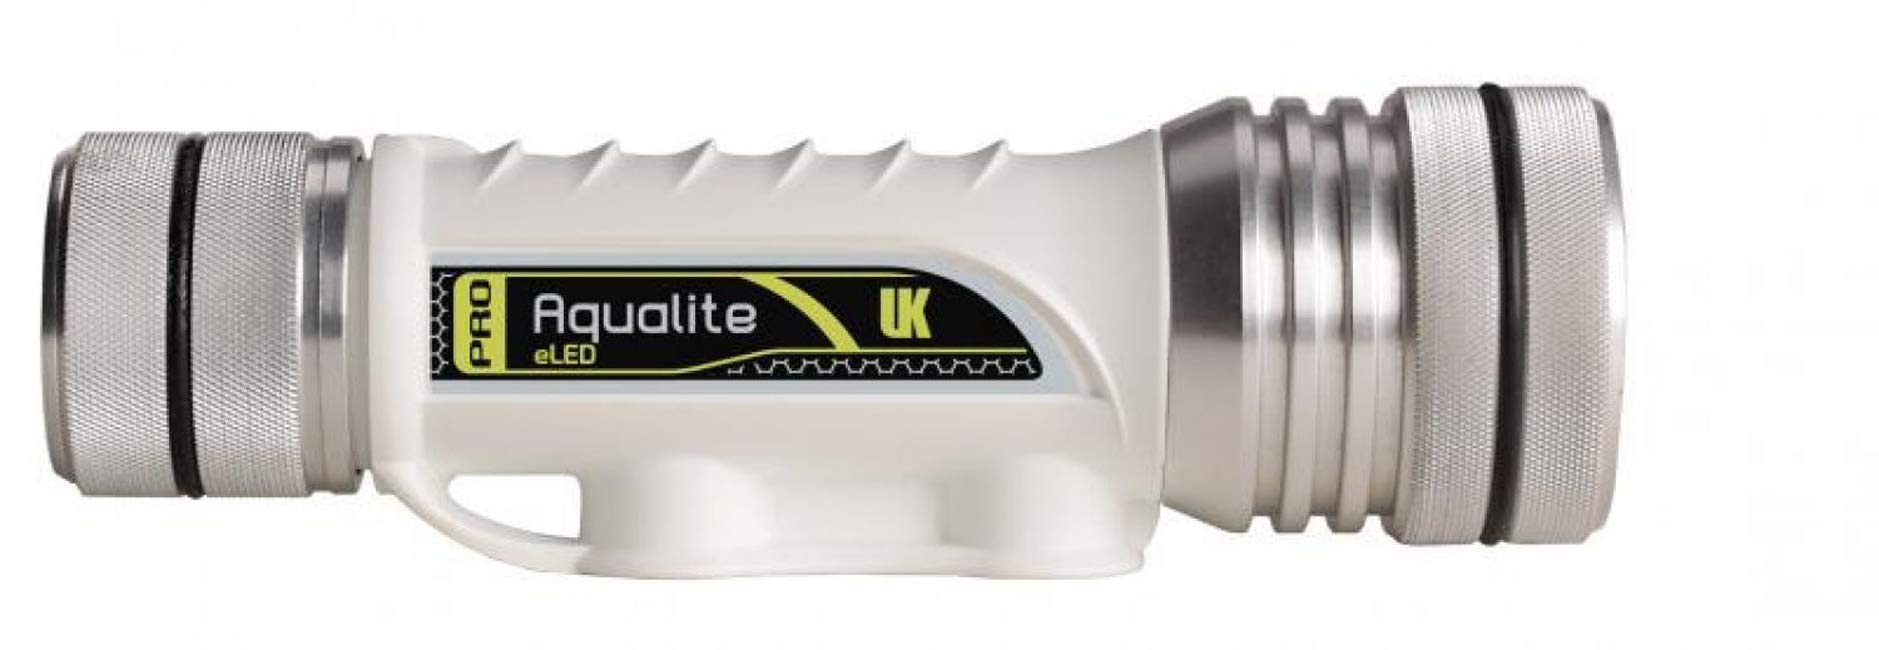 Underwater Kinetics Aqualite Pro 100° Dive Video Light, White by Underwater Kinetics